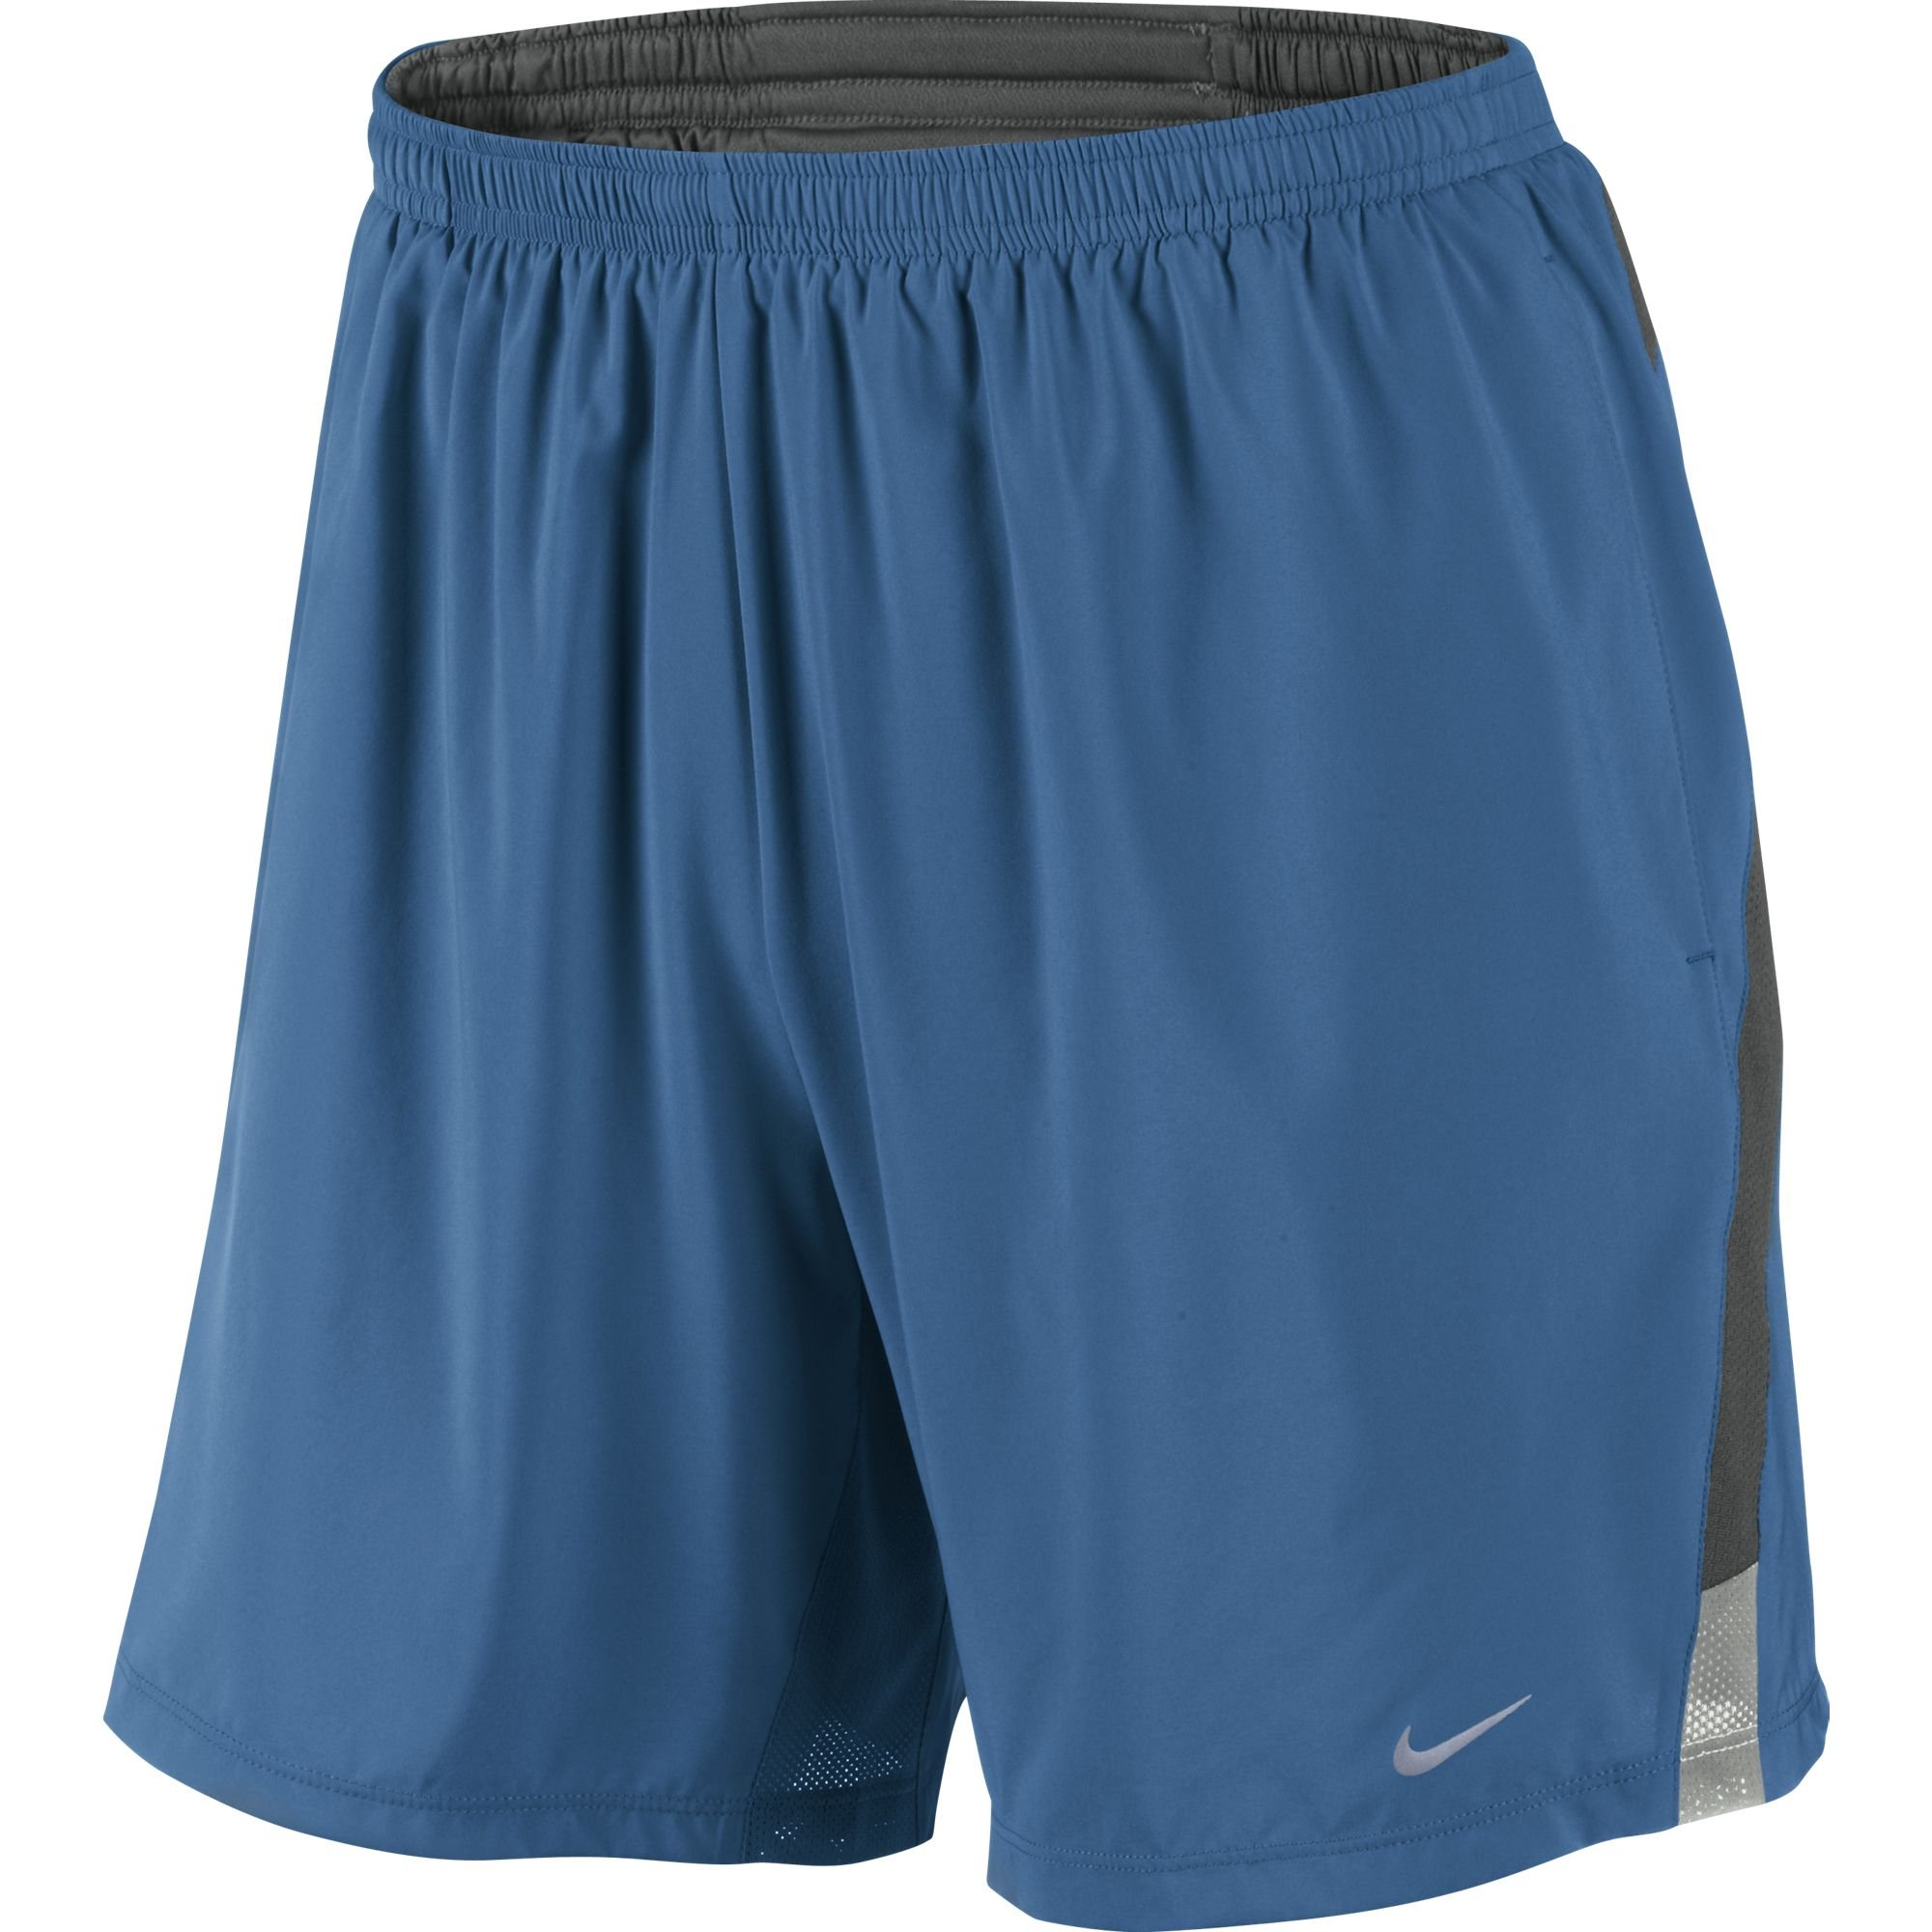 Nike Short Distance 17.8cm M v�tement running homme